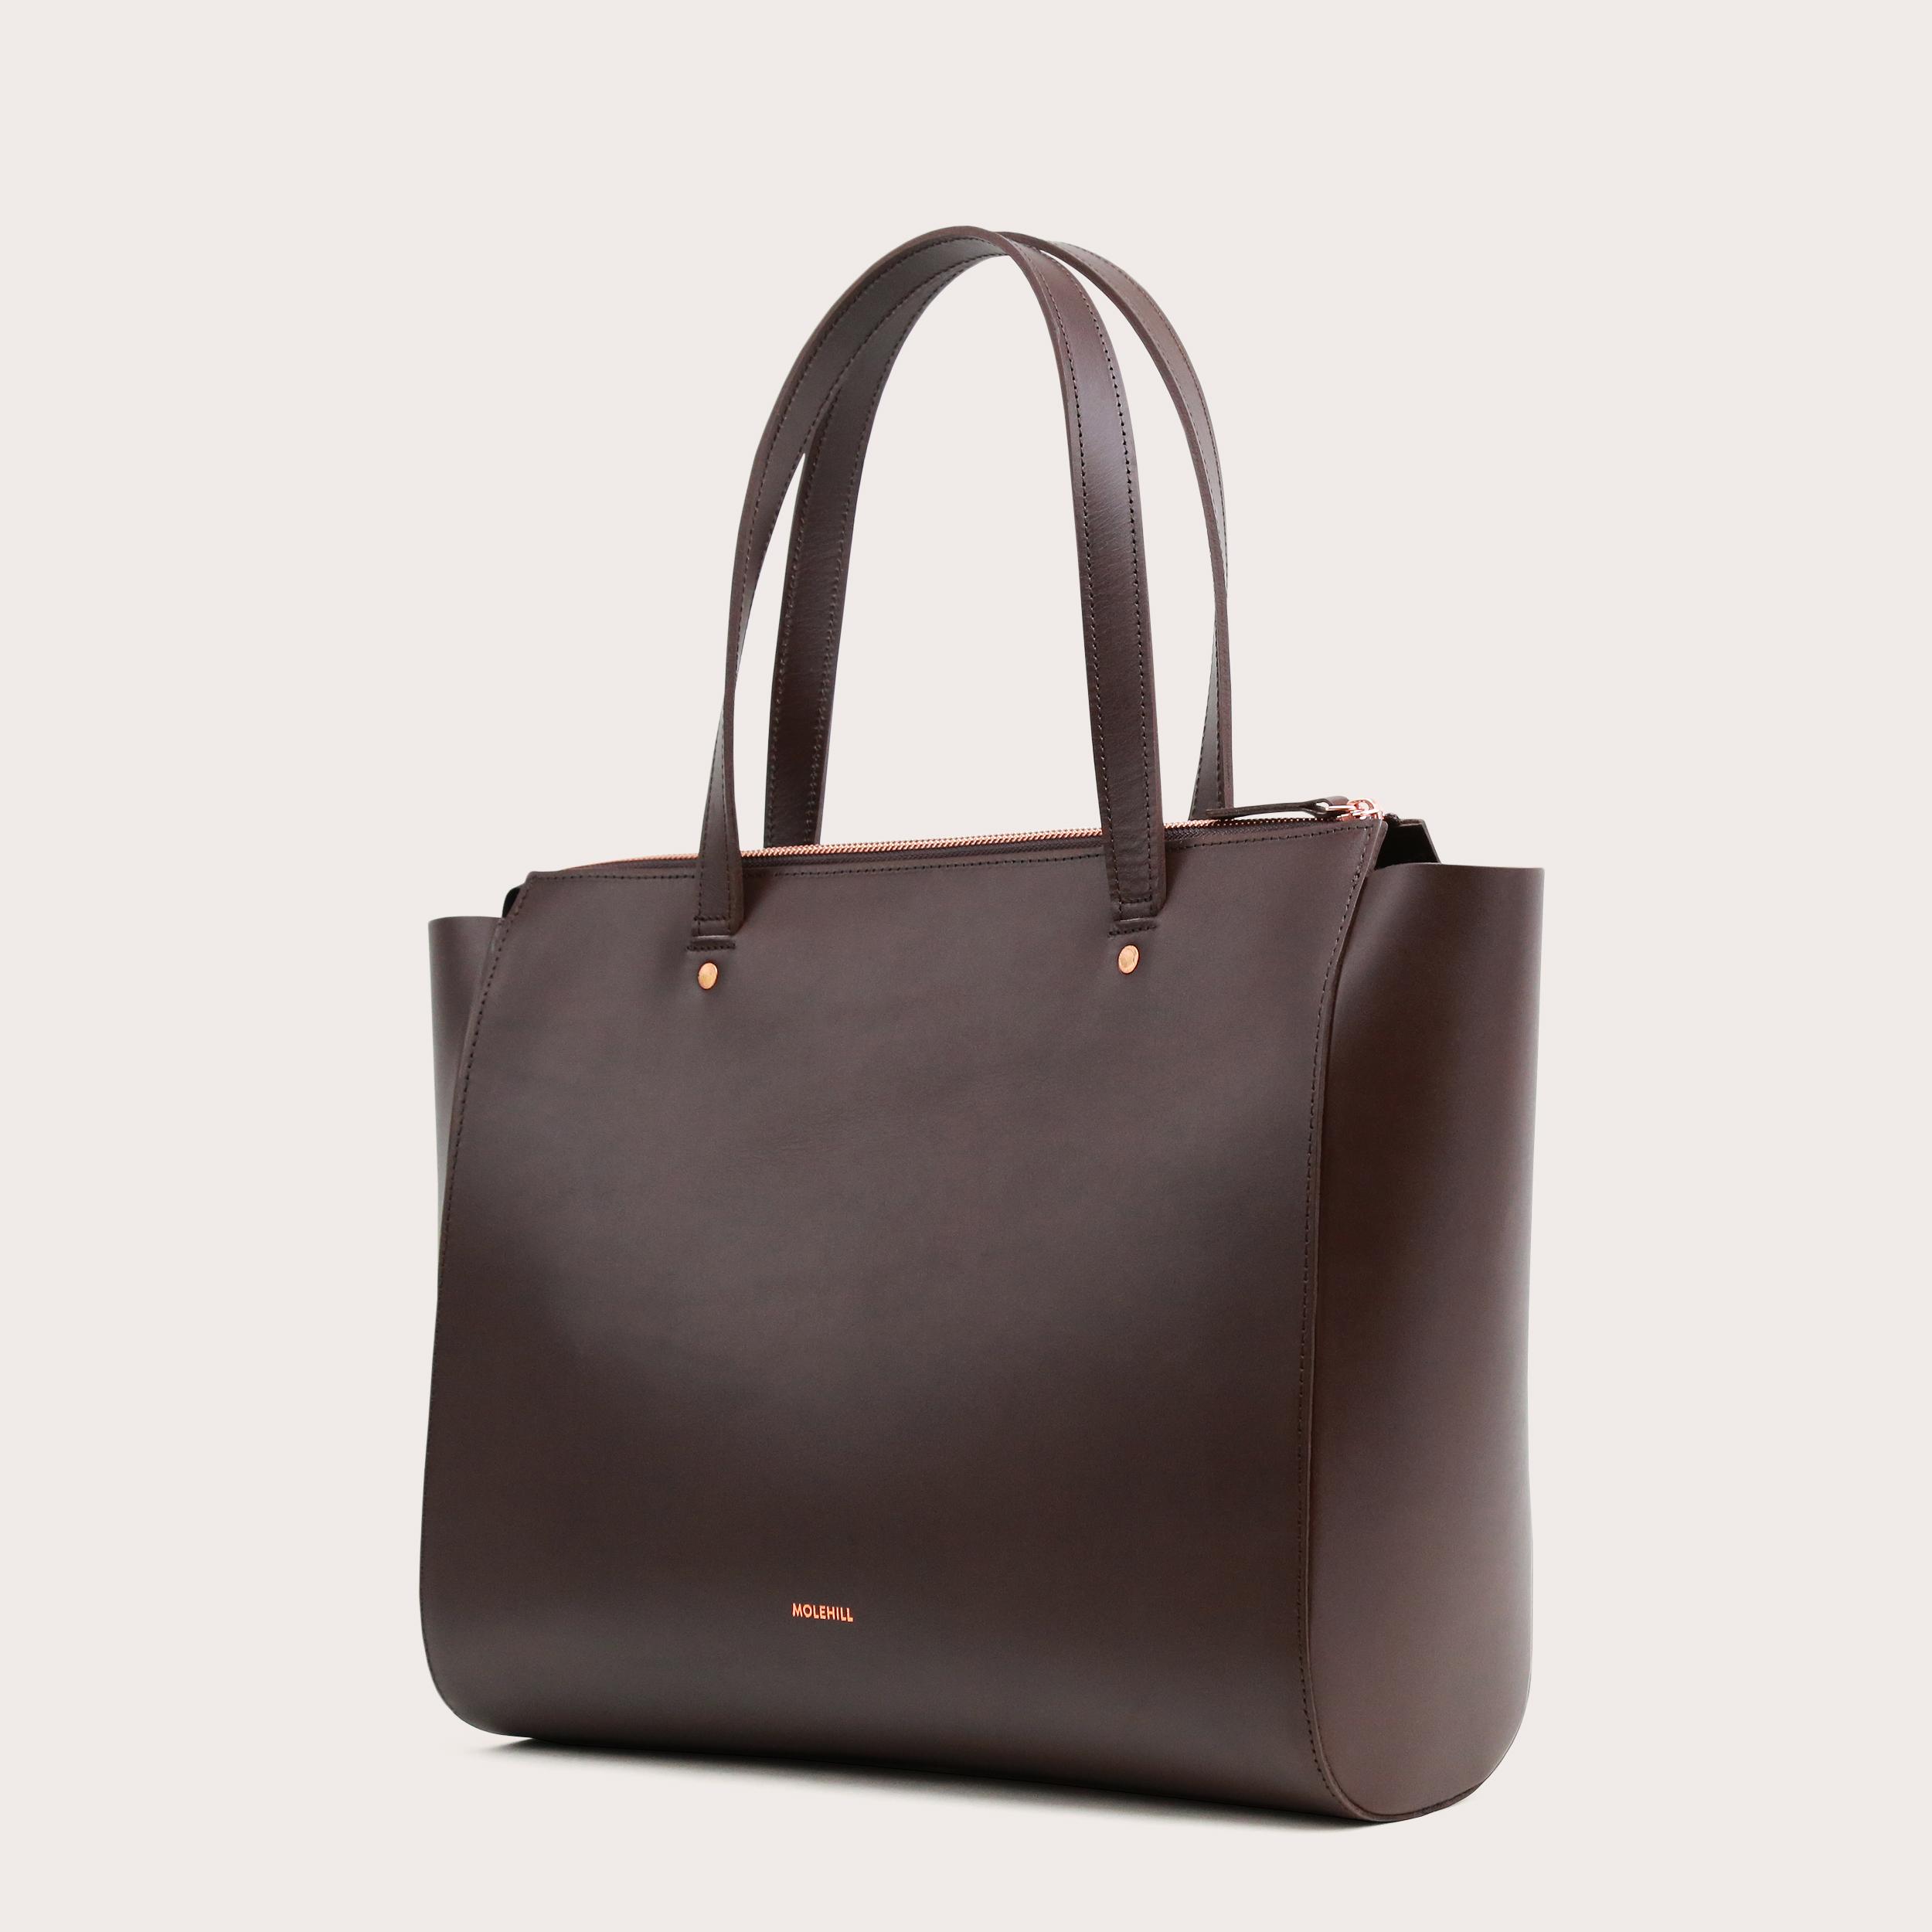 SUR Medium Everyday Bag Dark Chocolate-2